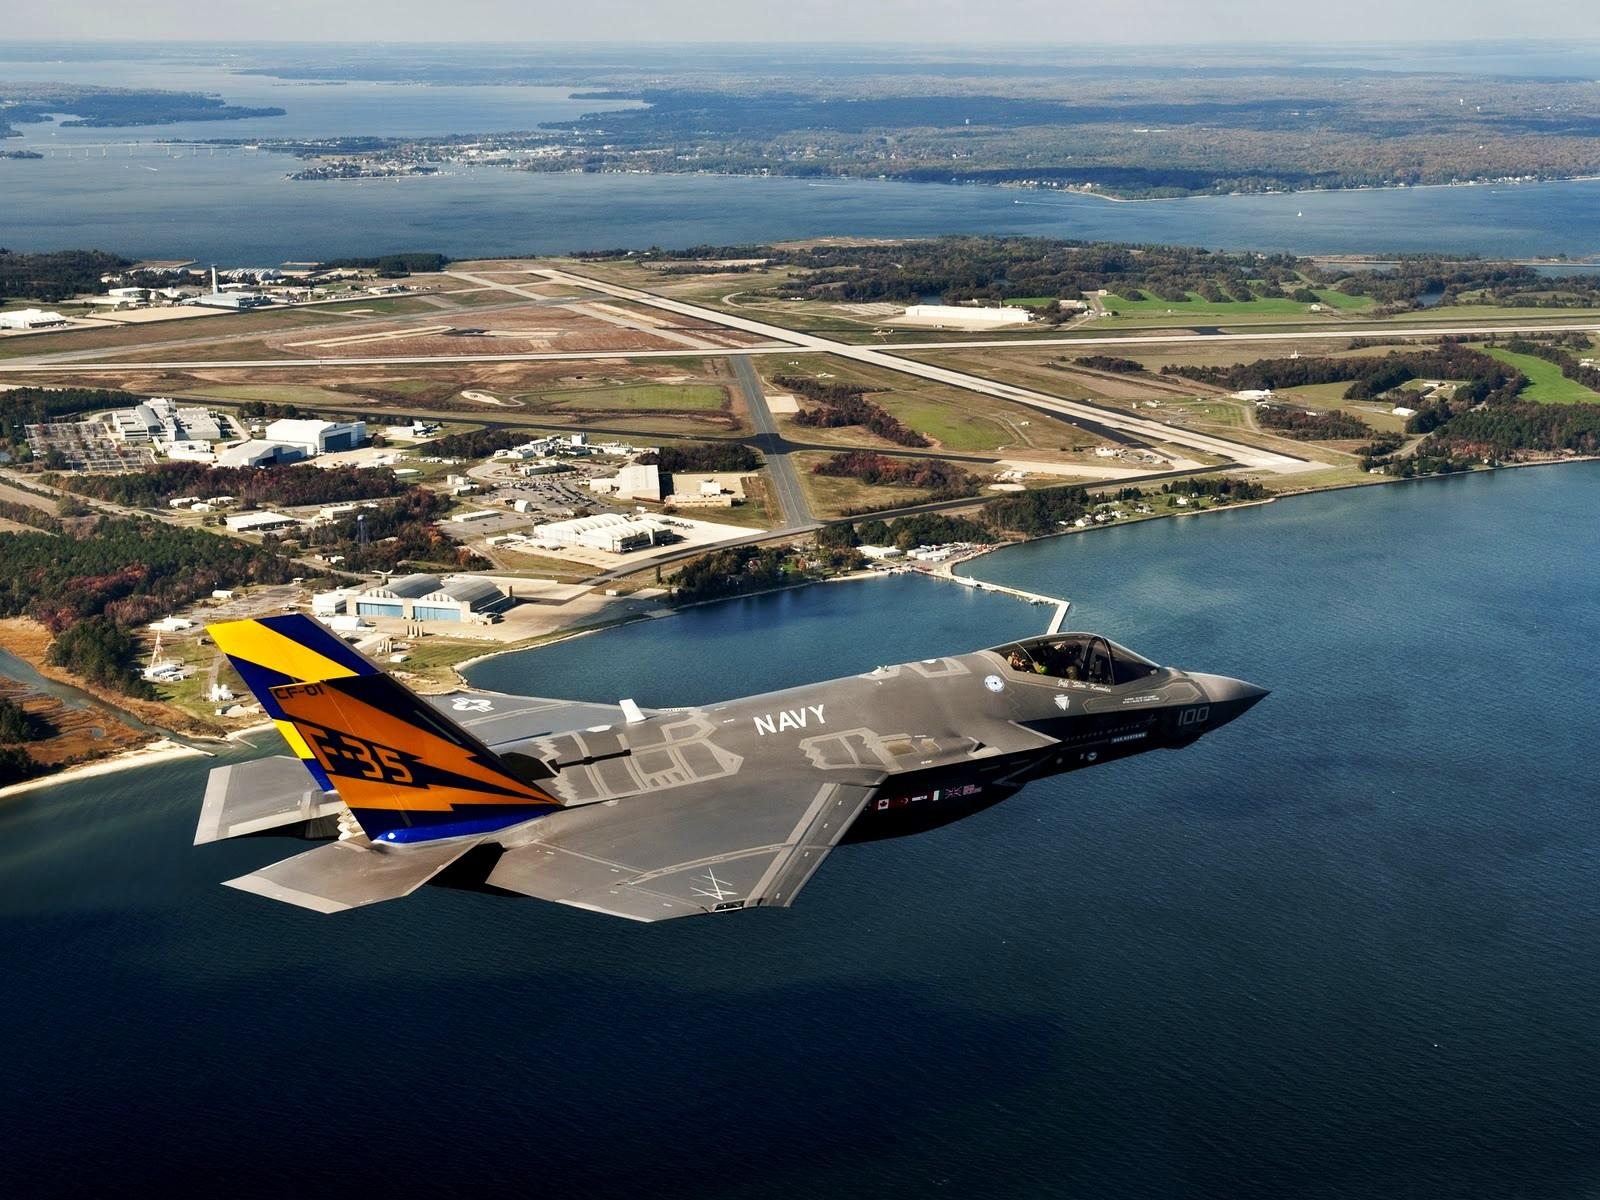 military-f35-lightning-ii-martin-f-35-ocean-lake-lockheed-water-airport-jet-plane-airplane-runway-sea-wallpaper-background-free